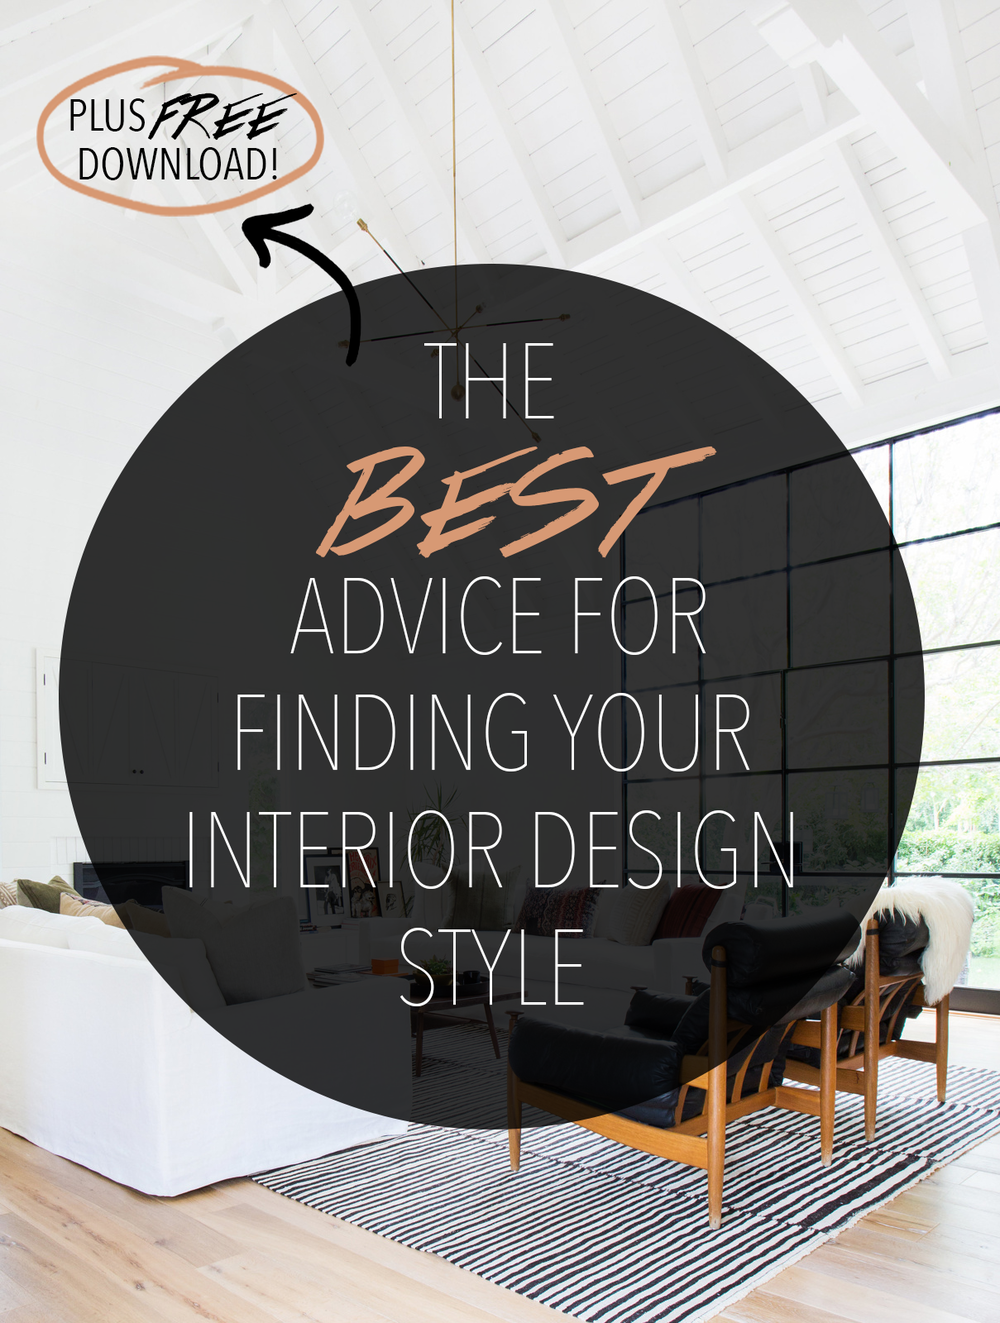 Find Your Interior Design Stlye